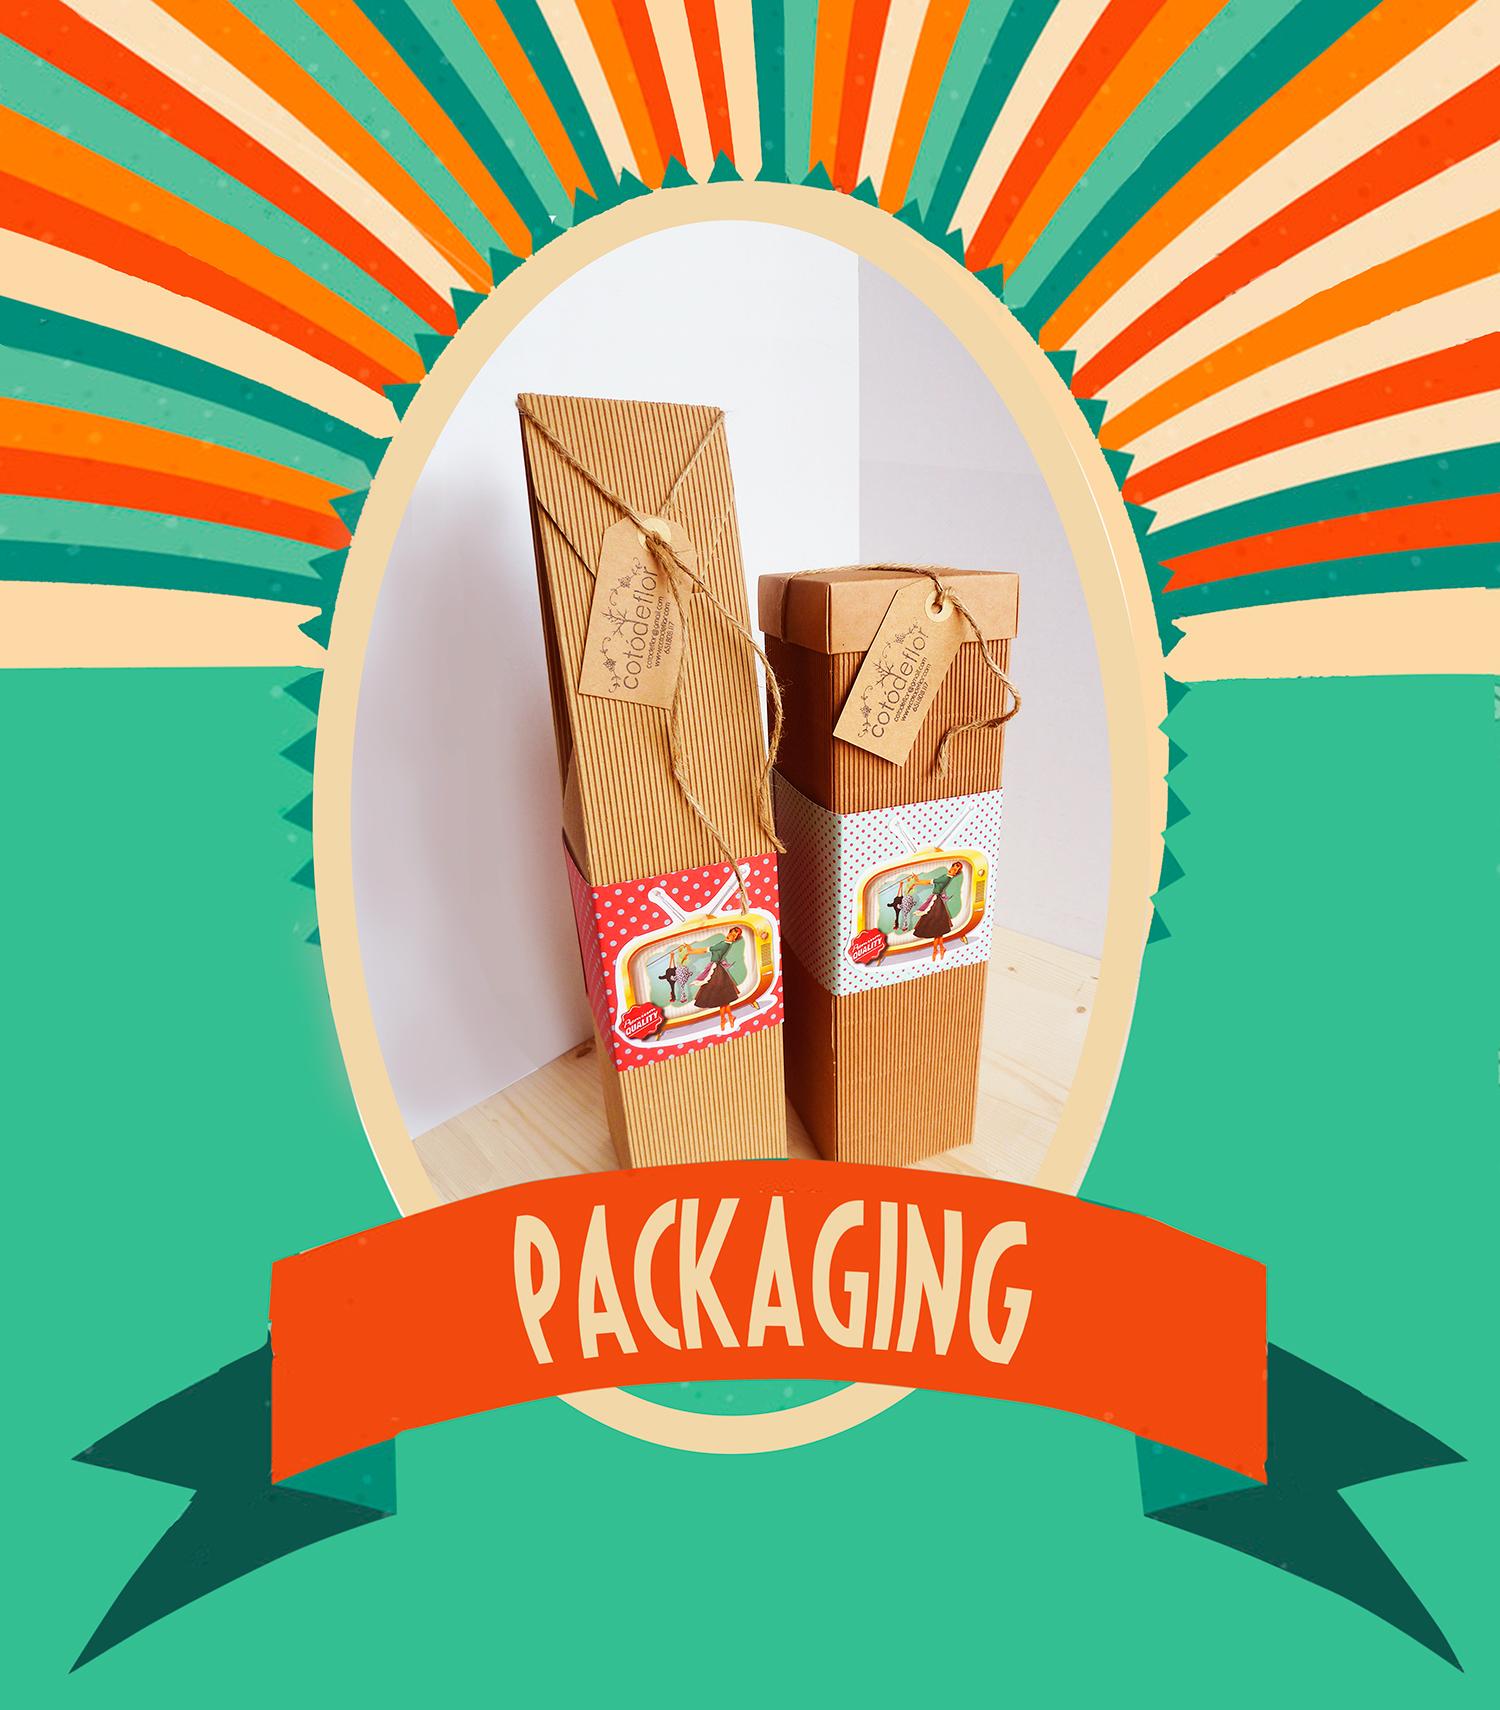 packaging regal pels pollastres